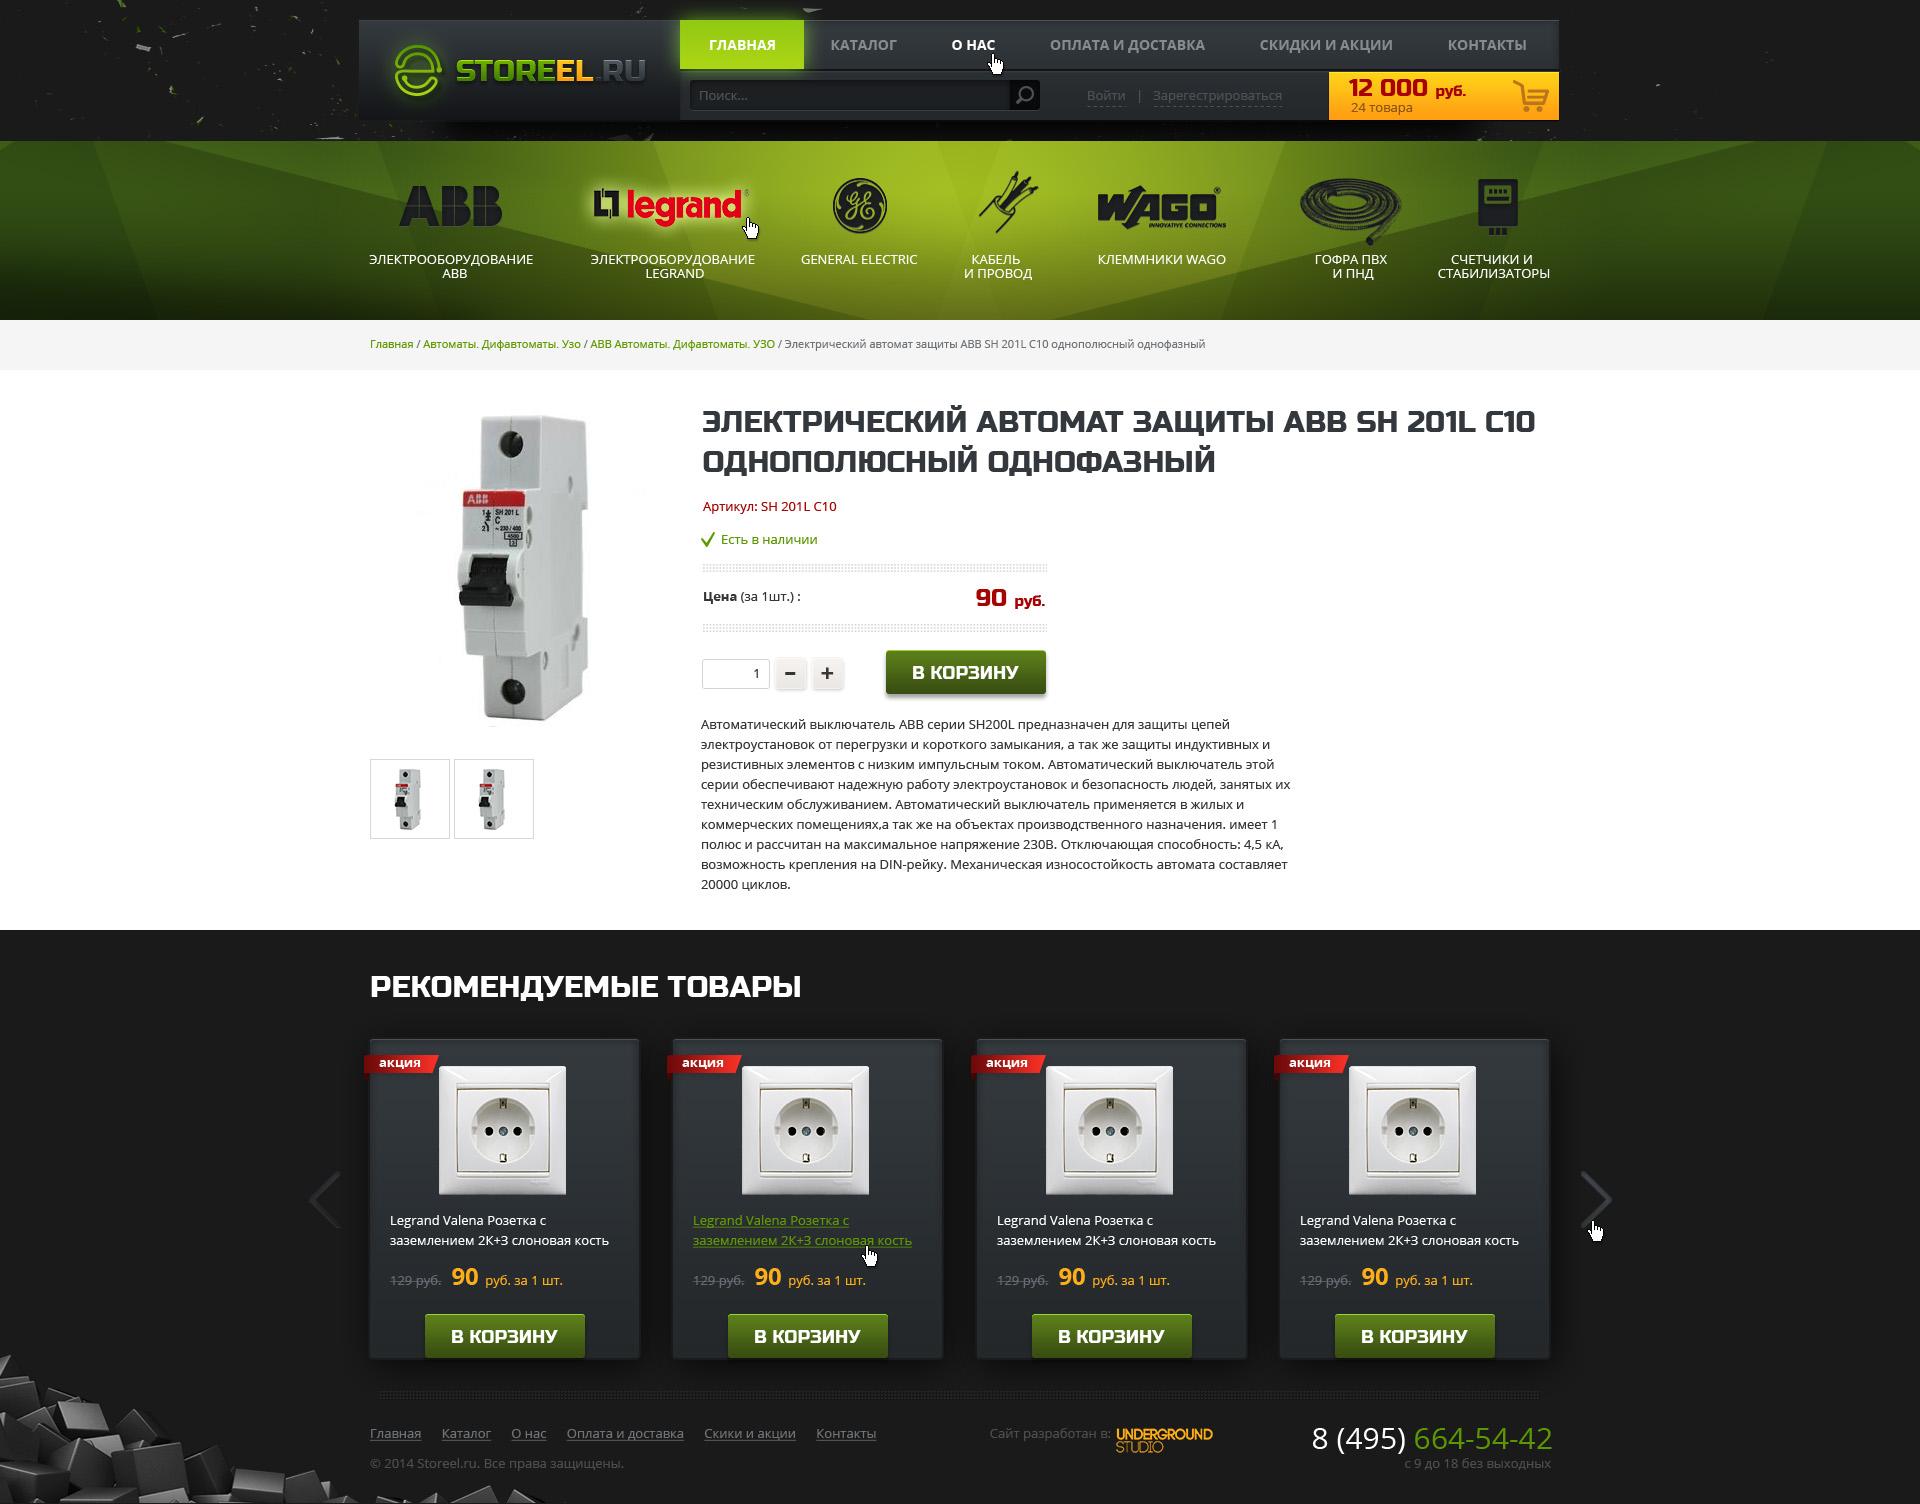 Интернет магазин Storeel.ru